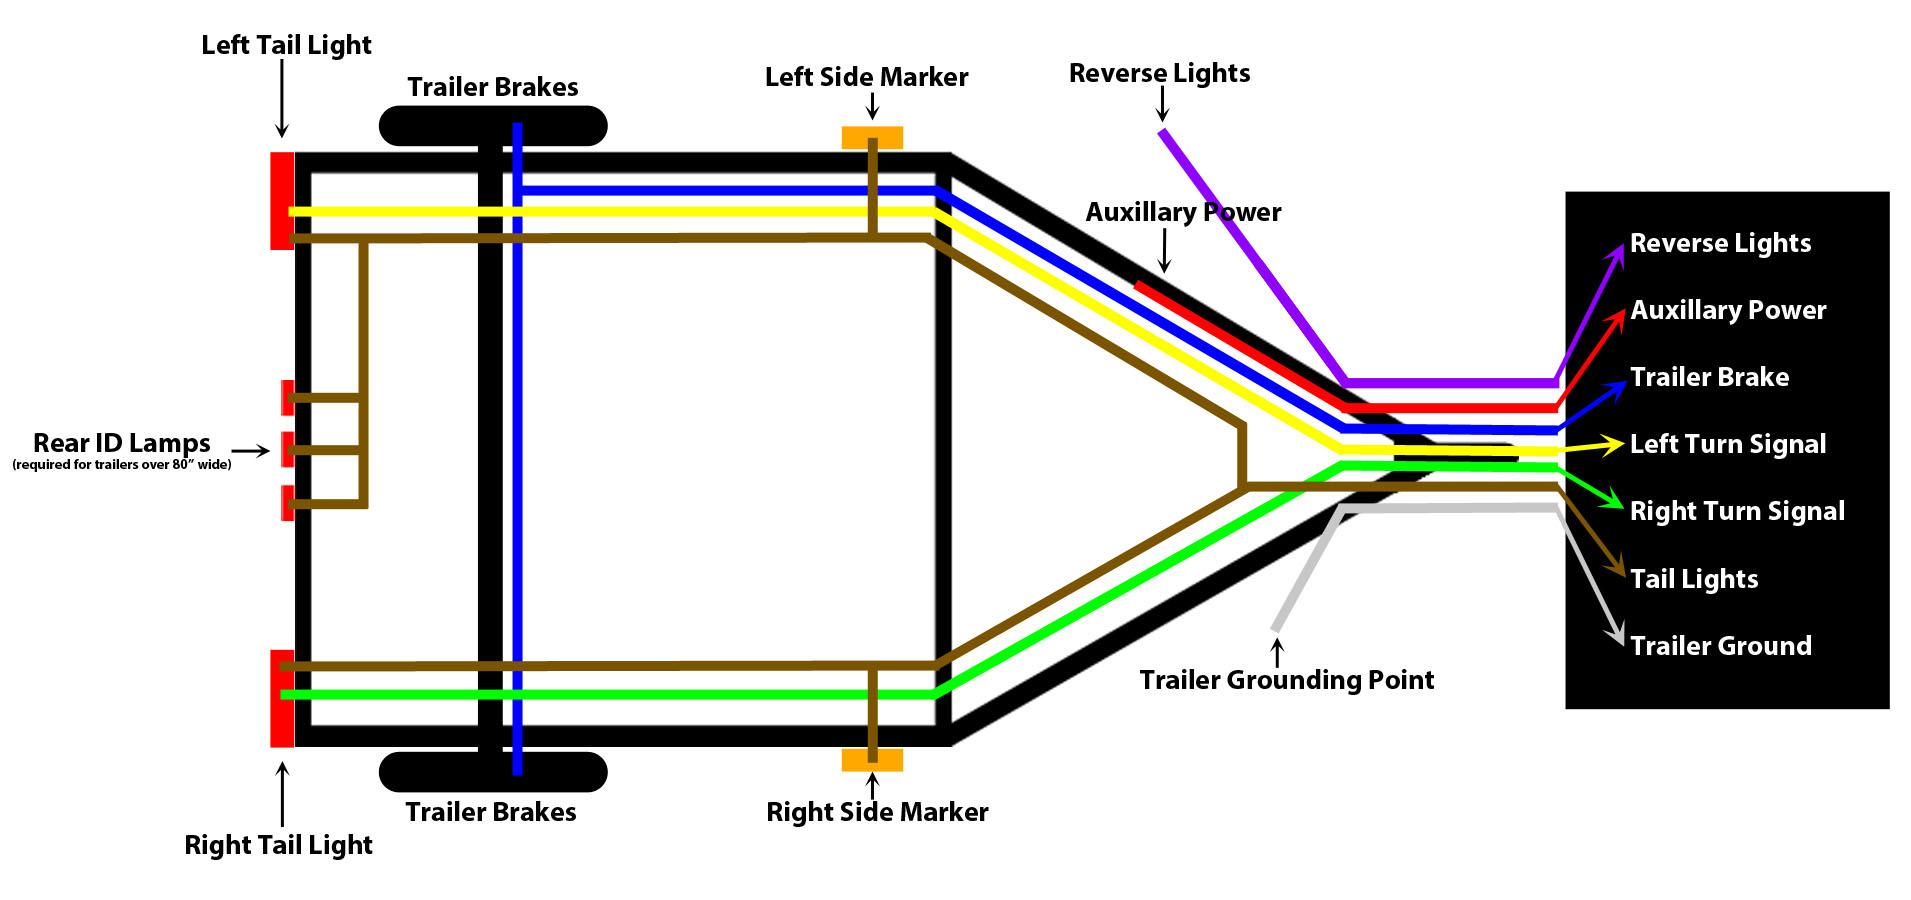 Hitch Wiring Harness Diagram - Wiring Diagram Explained - Trailer Hitch Wiring Diagram